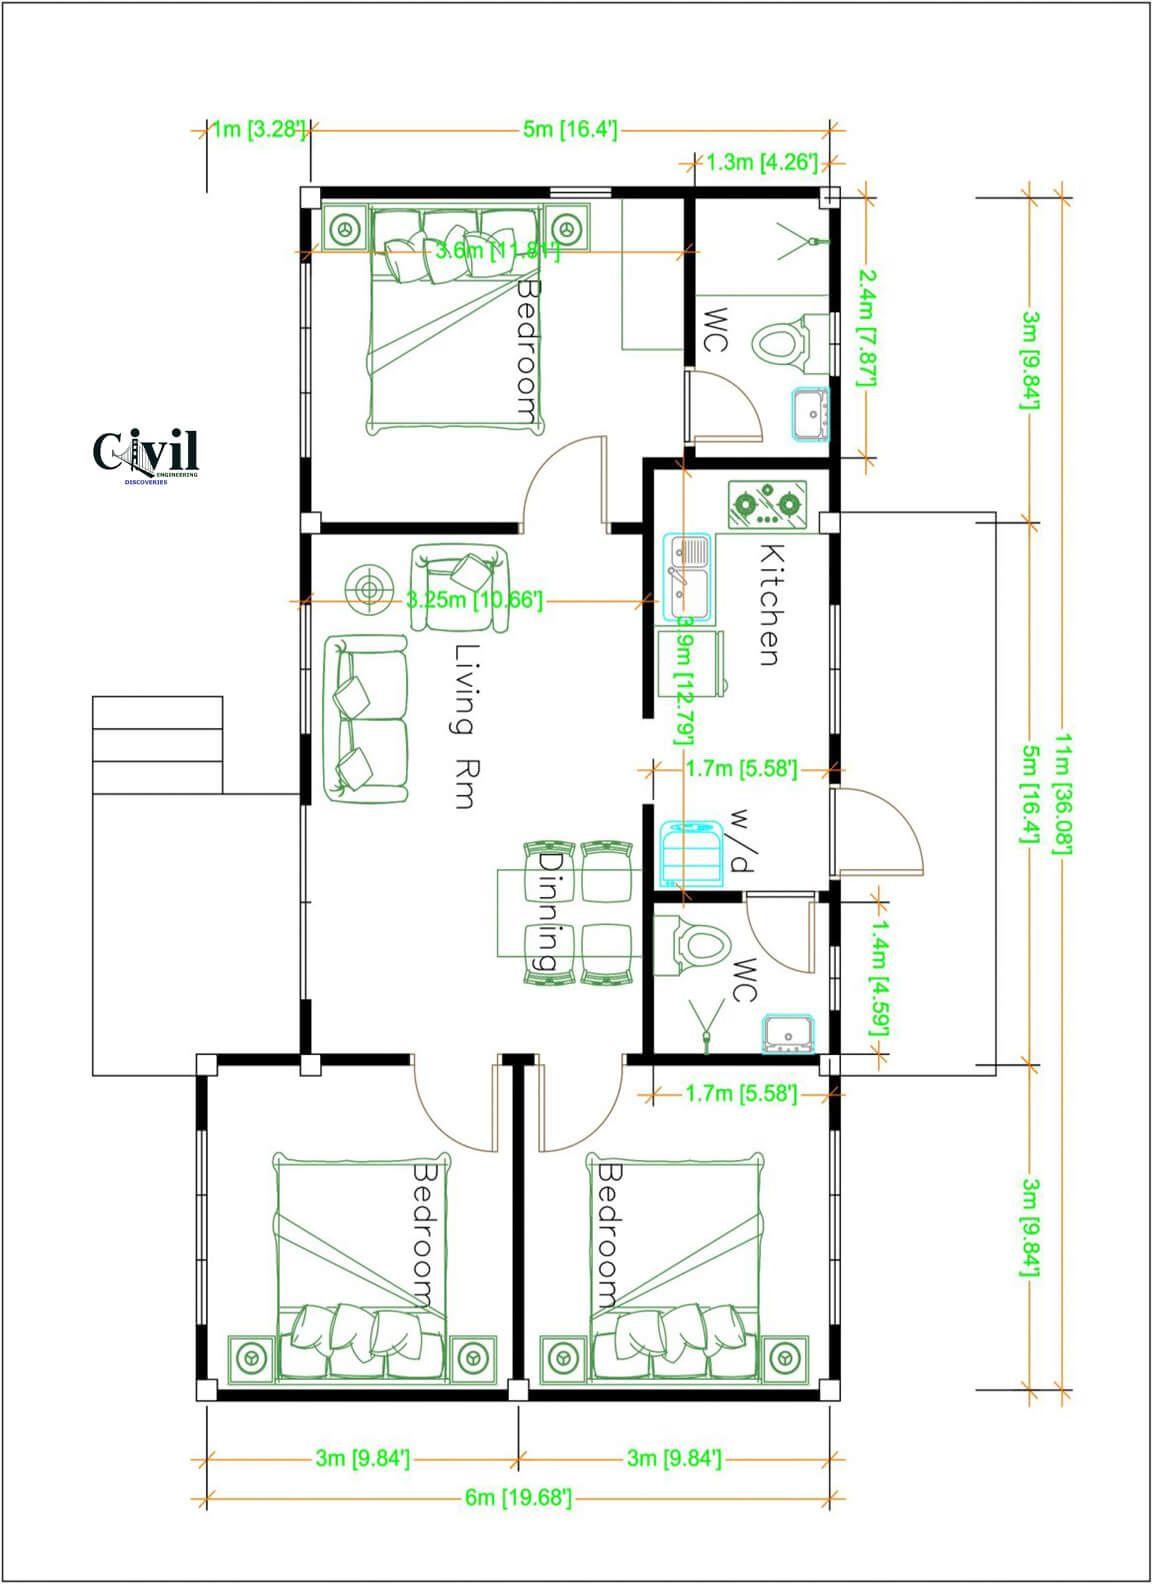 House Design Plans 11 6 Meters 36 20 Feet 3 Bedrooms Engineering Discoveries Home Design Plans House Design Modern House Floor Plans